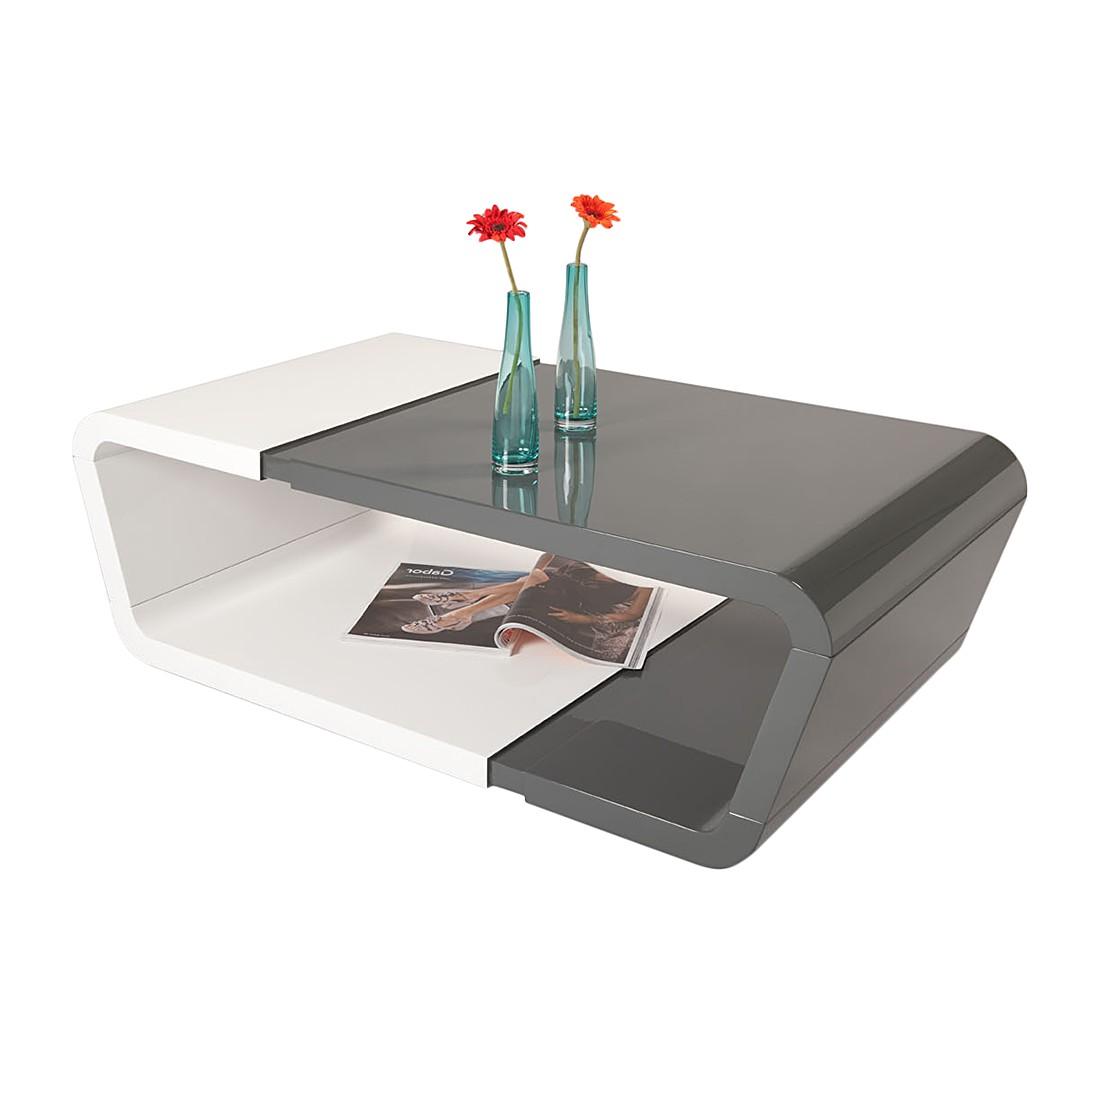 knoxhult k che grau ikea tipps vom einrichter. Black Bedroom Furniture Sets. Home Design Ideas